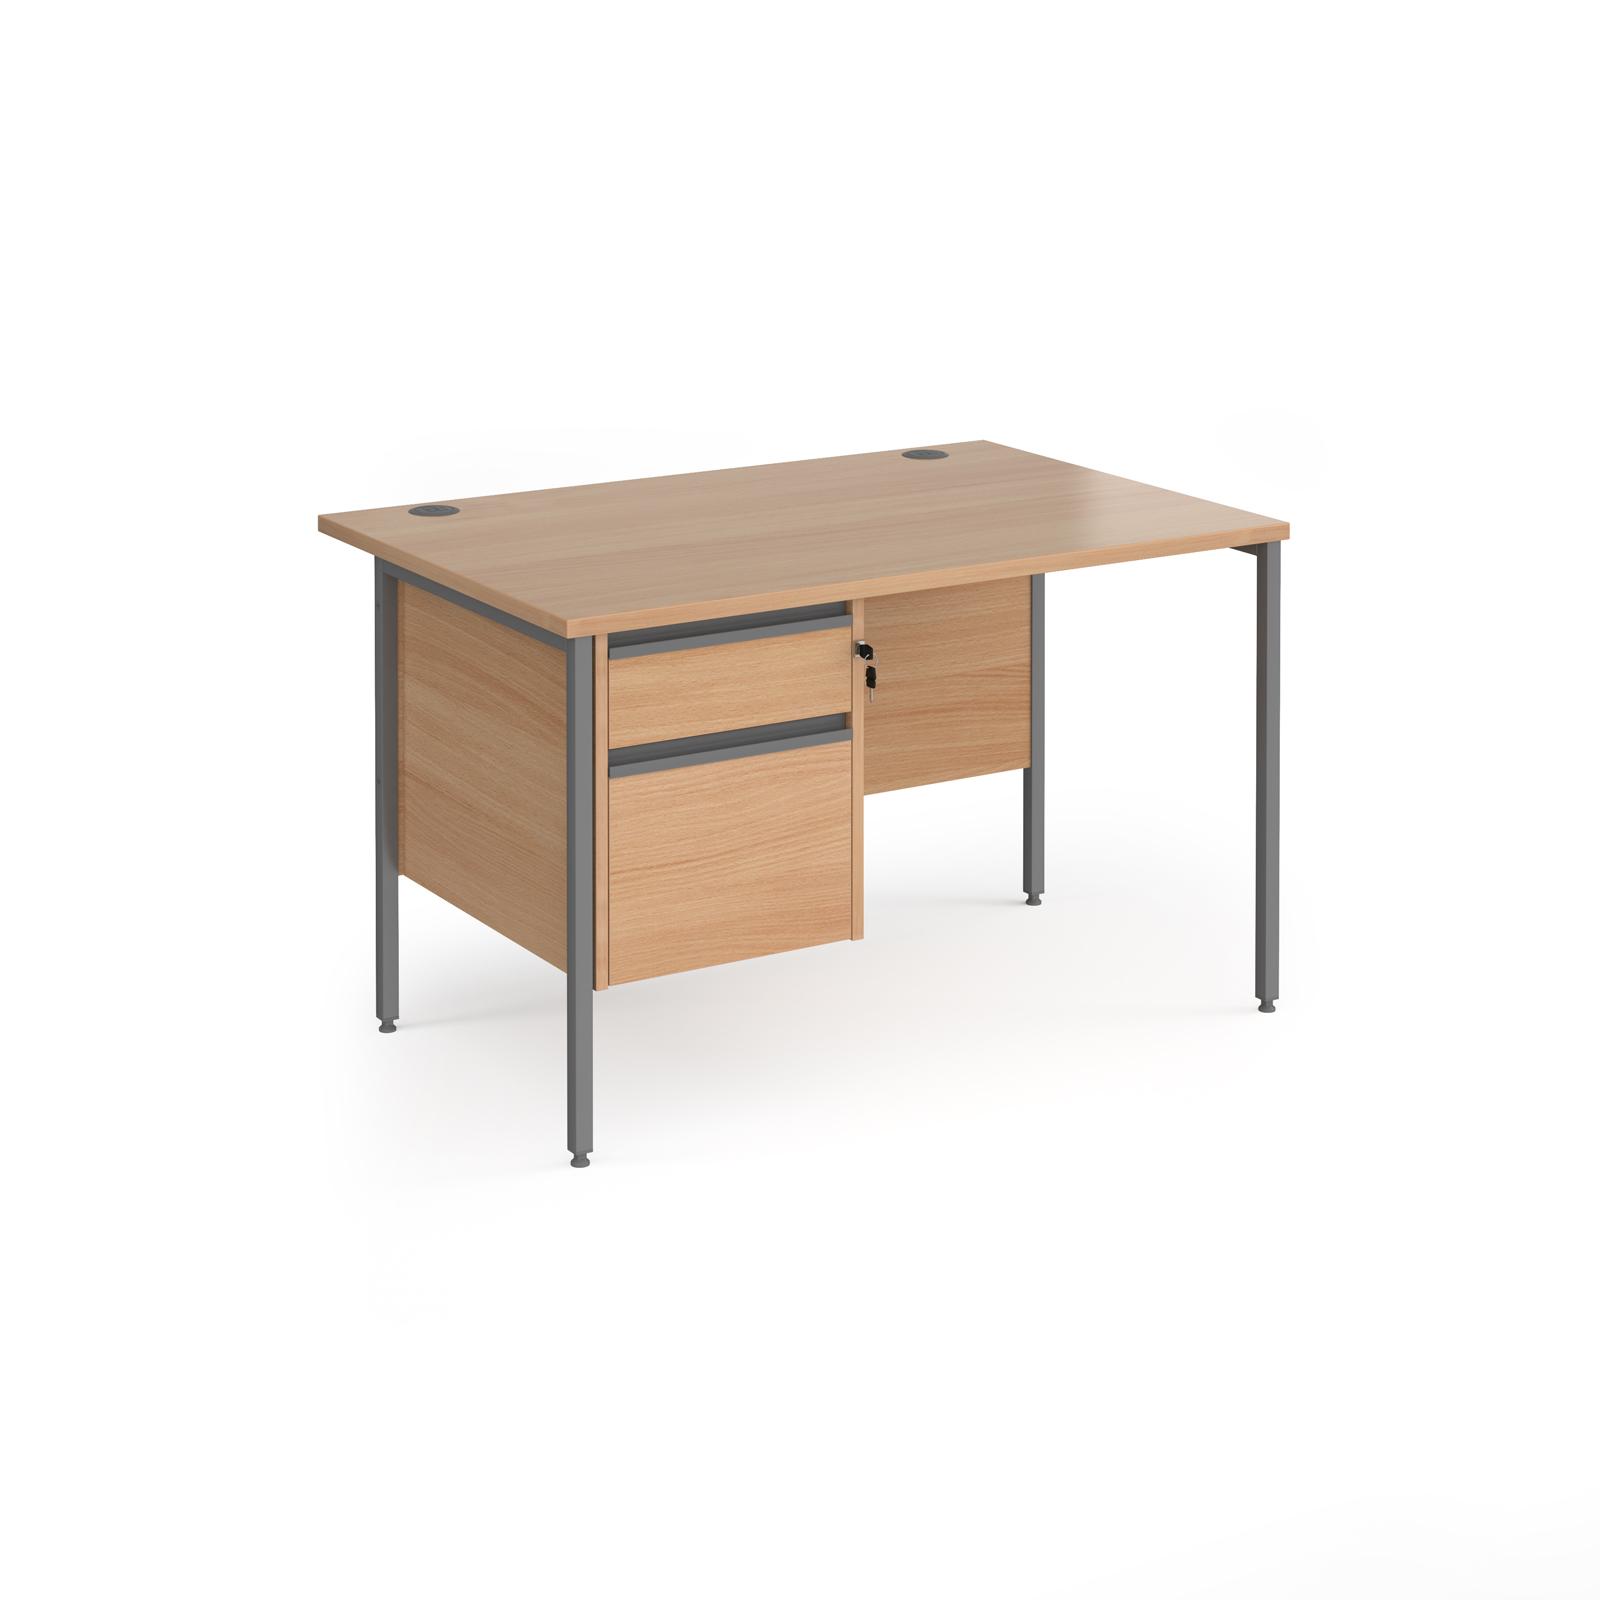 Rectangular Desks Contract 25 H-Frame straight desk with 2 drawer pedestal